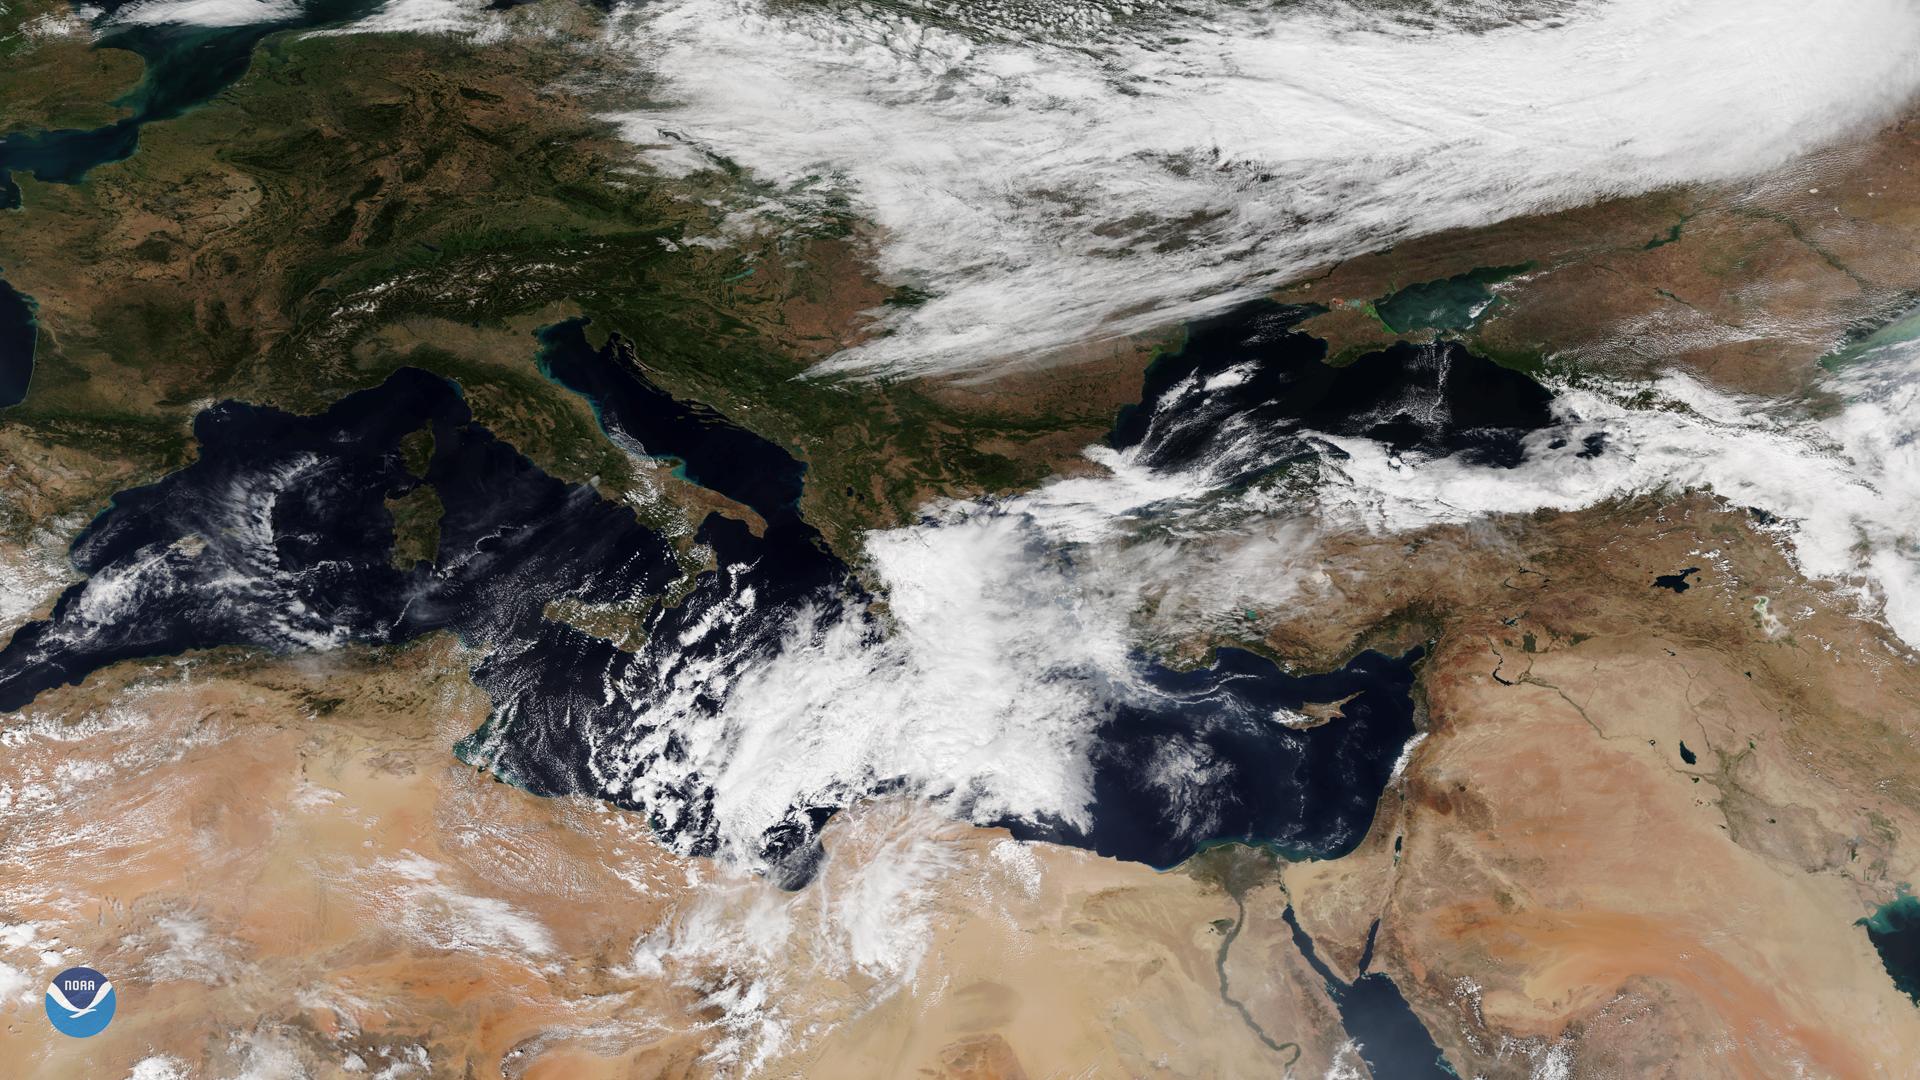 Tropical-Like Cyclone Headed for Crete and Greece